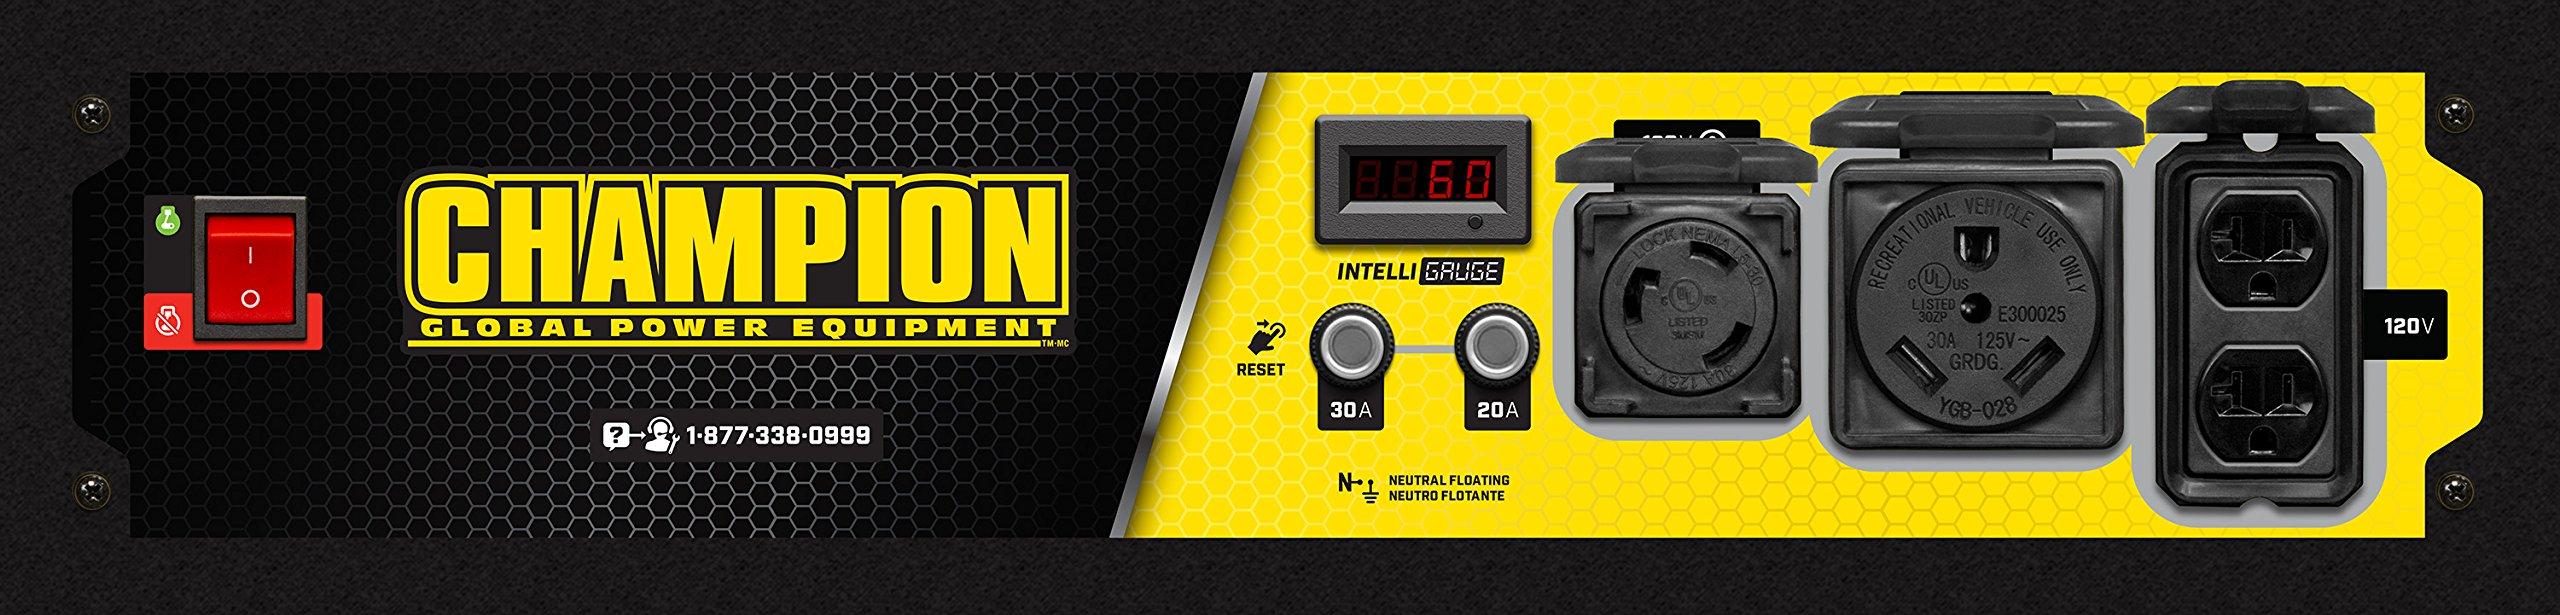 Champion Power Equipment 100555 RV Ready Portable Generator, Yellow and Black by Champion Power Equipment (Image #5)